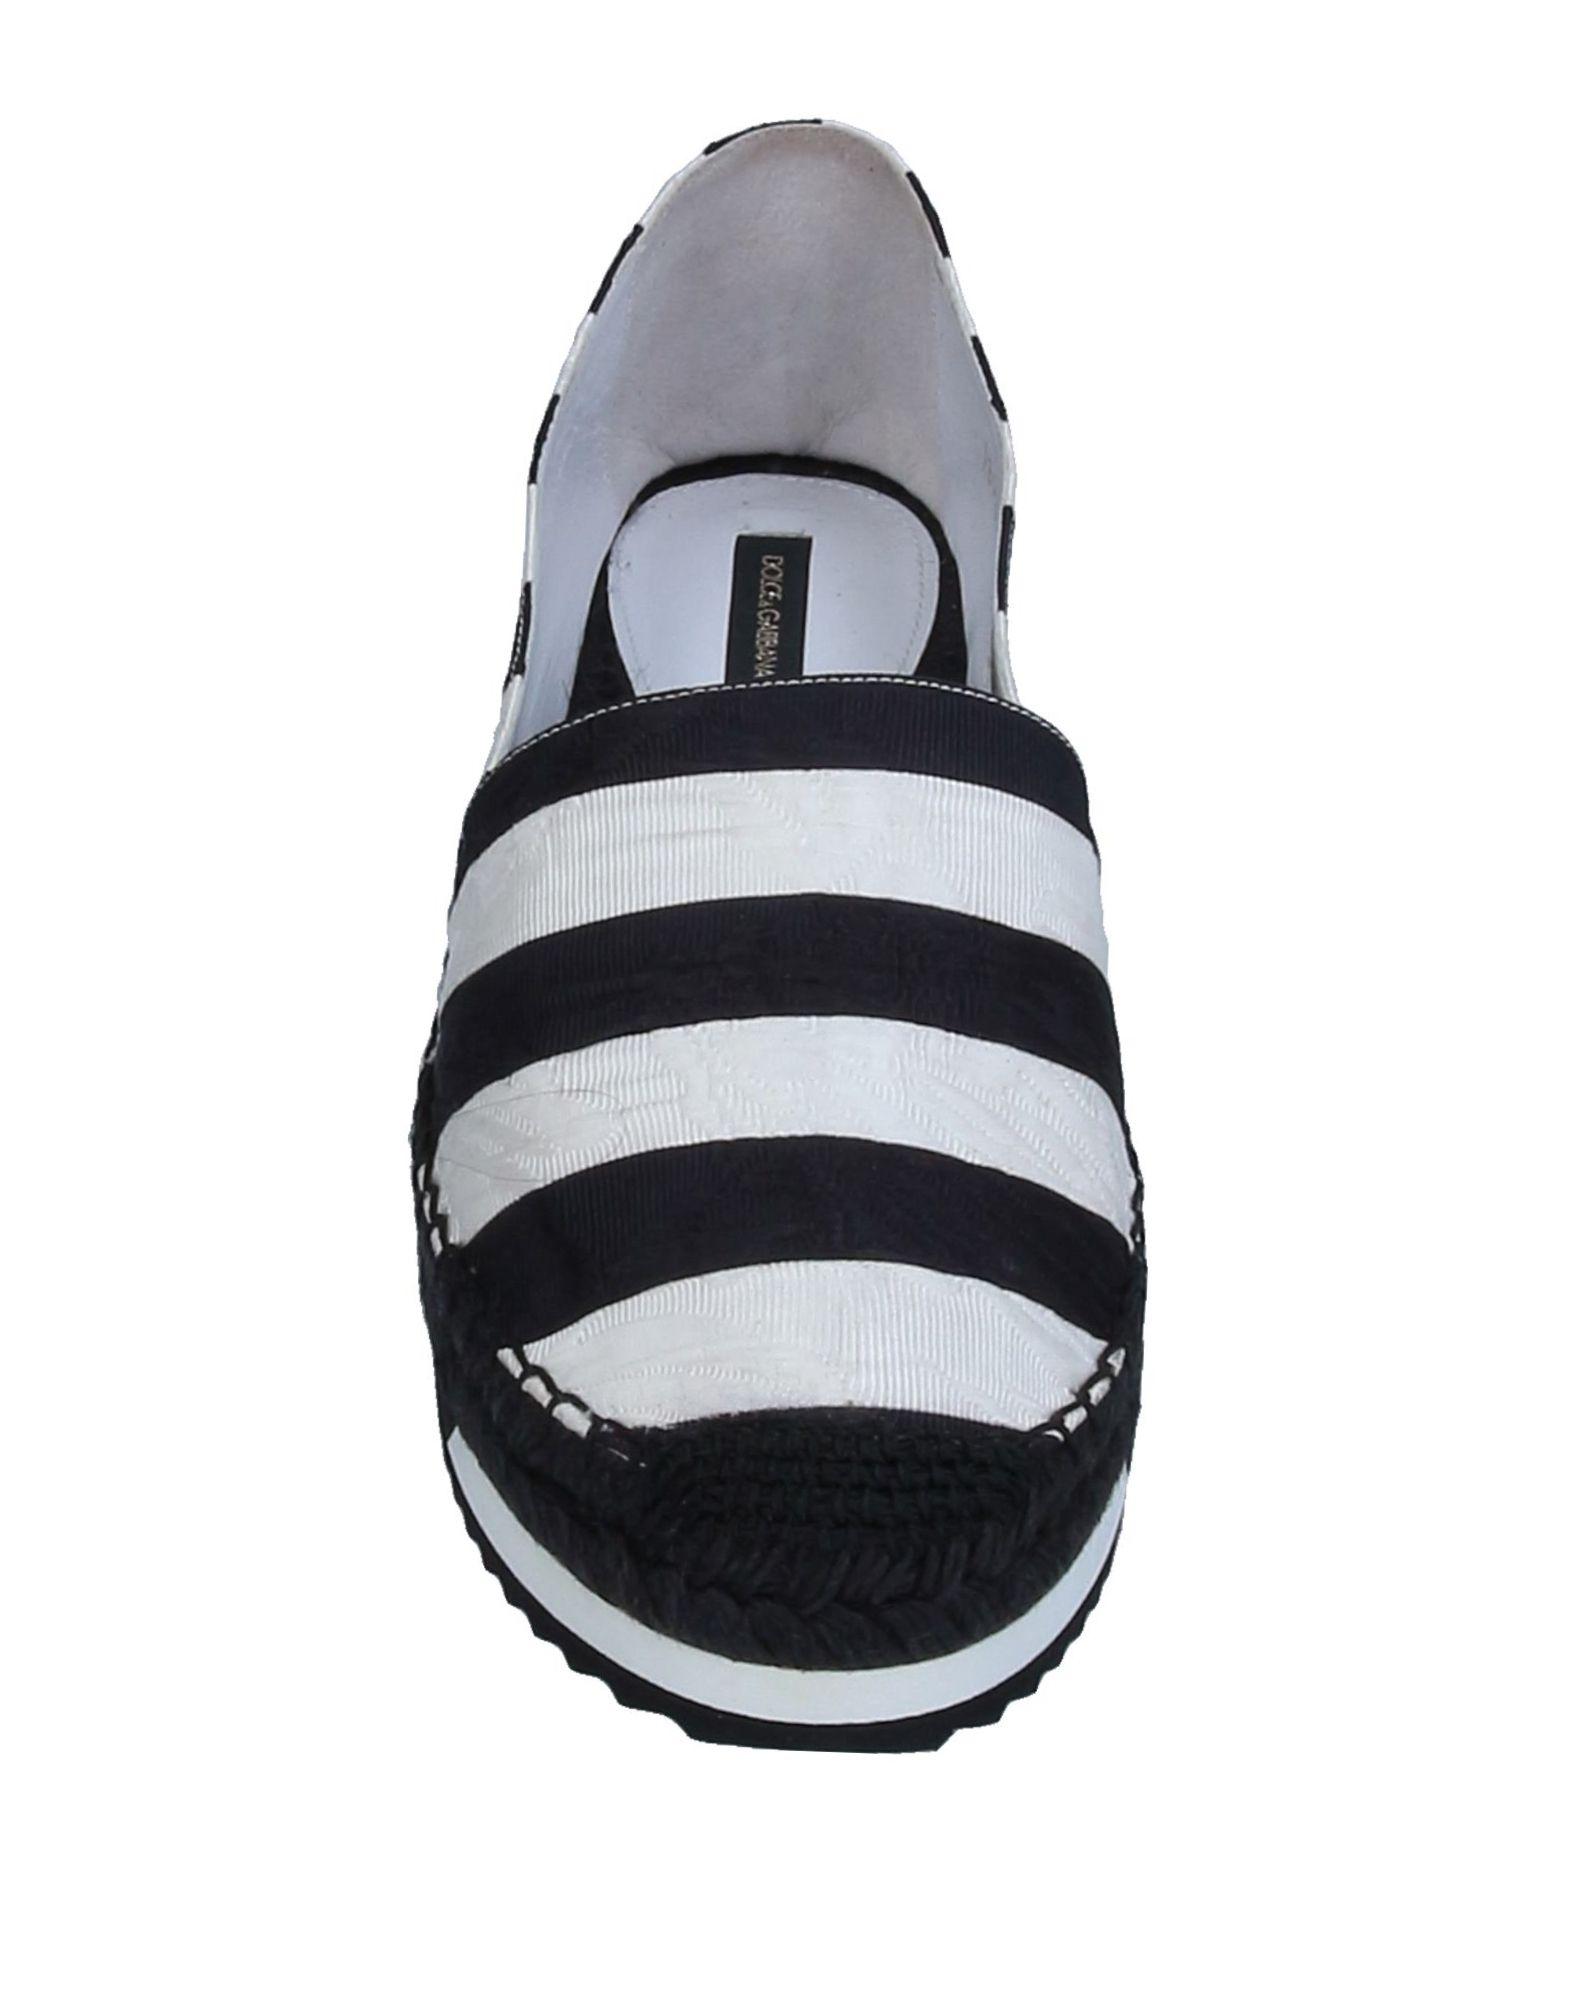 Dolce & Sneakers Gabbana Sneakers & Damen  11348963TG Neue Schuhe 02b5ca